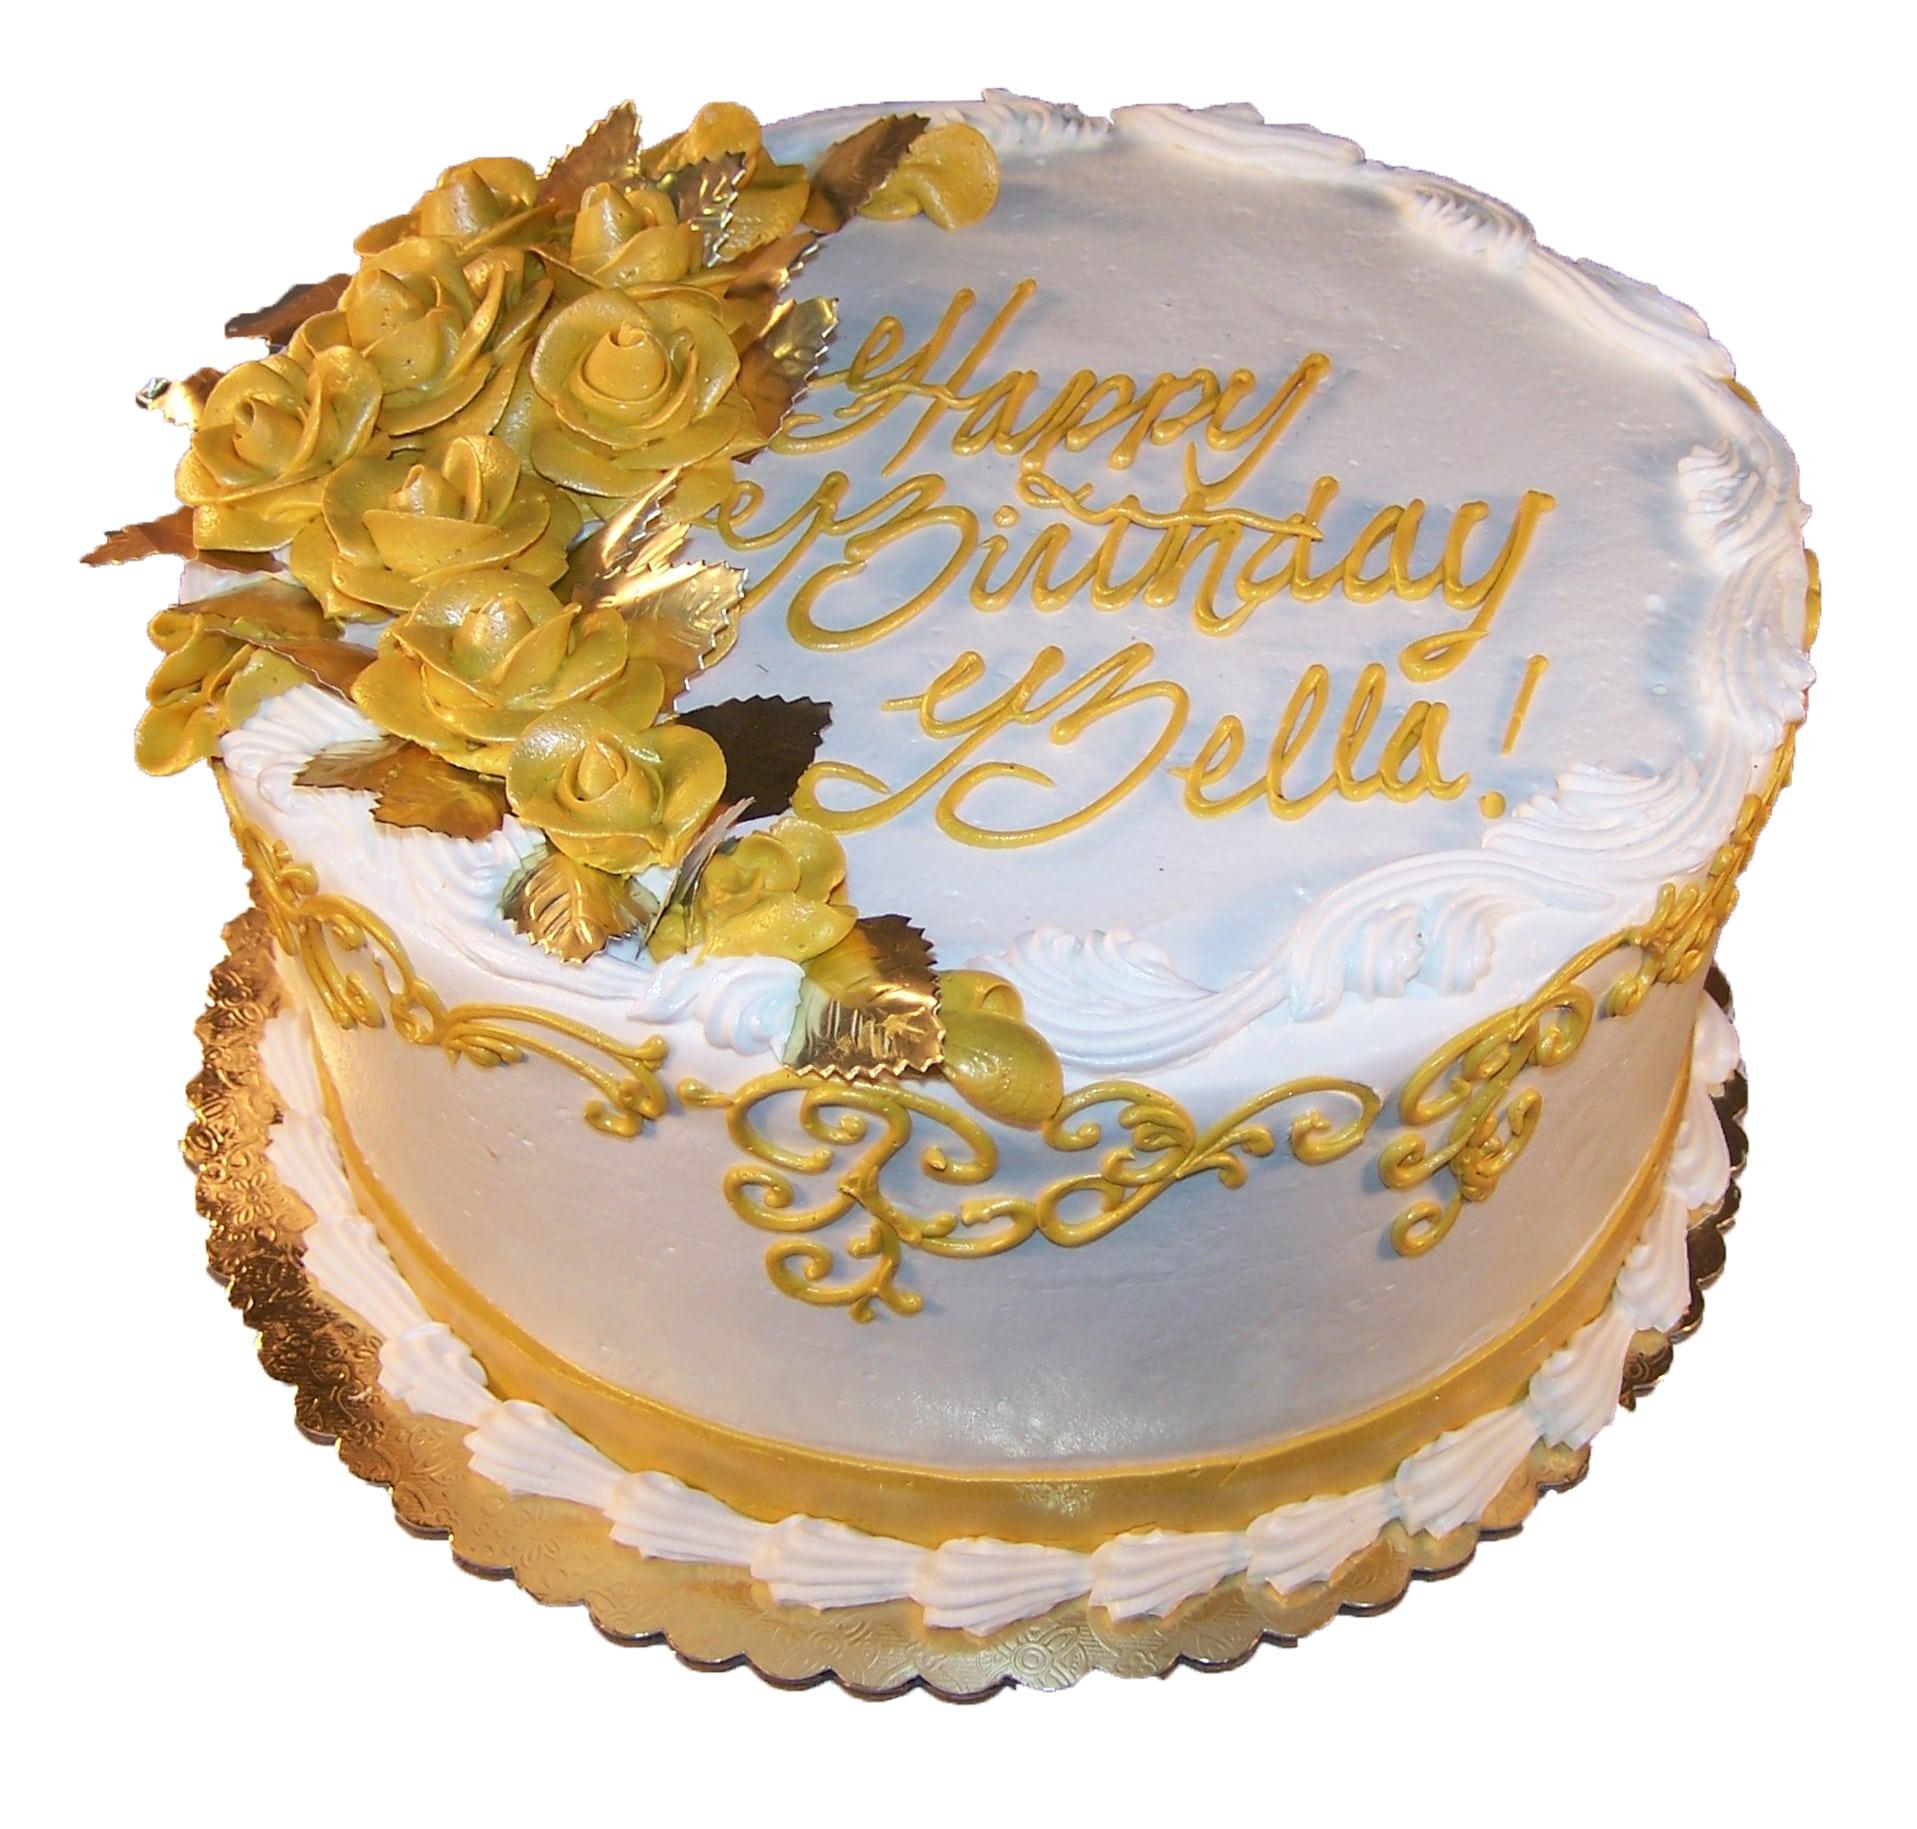 Astounding Birthday Cake 51 Aggies Bakery Cake Shop Funny Birthday Cards Online Inifofree Goldxyz